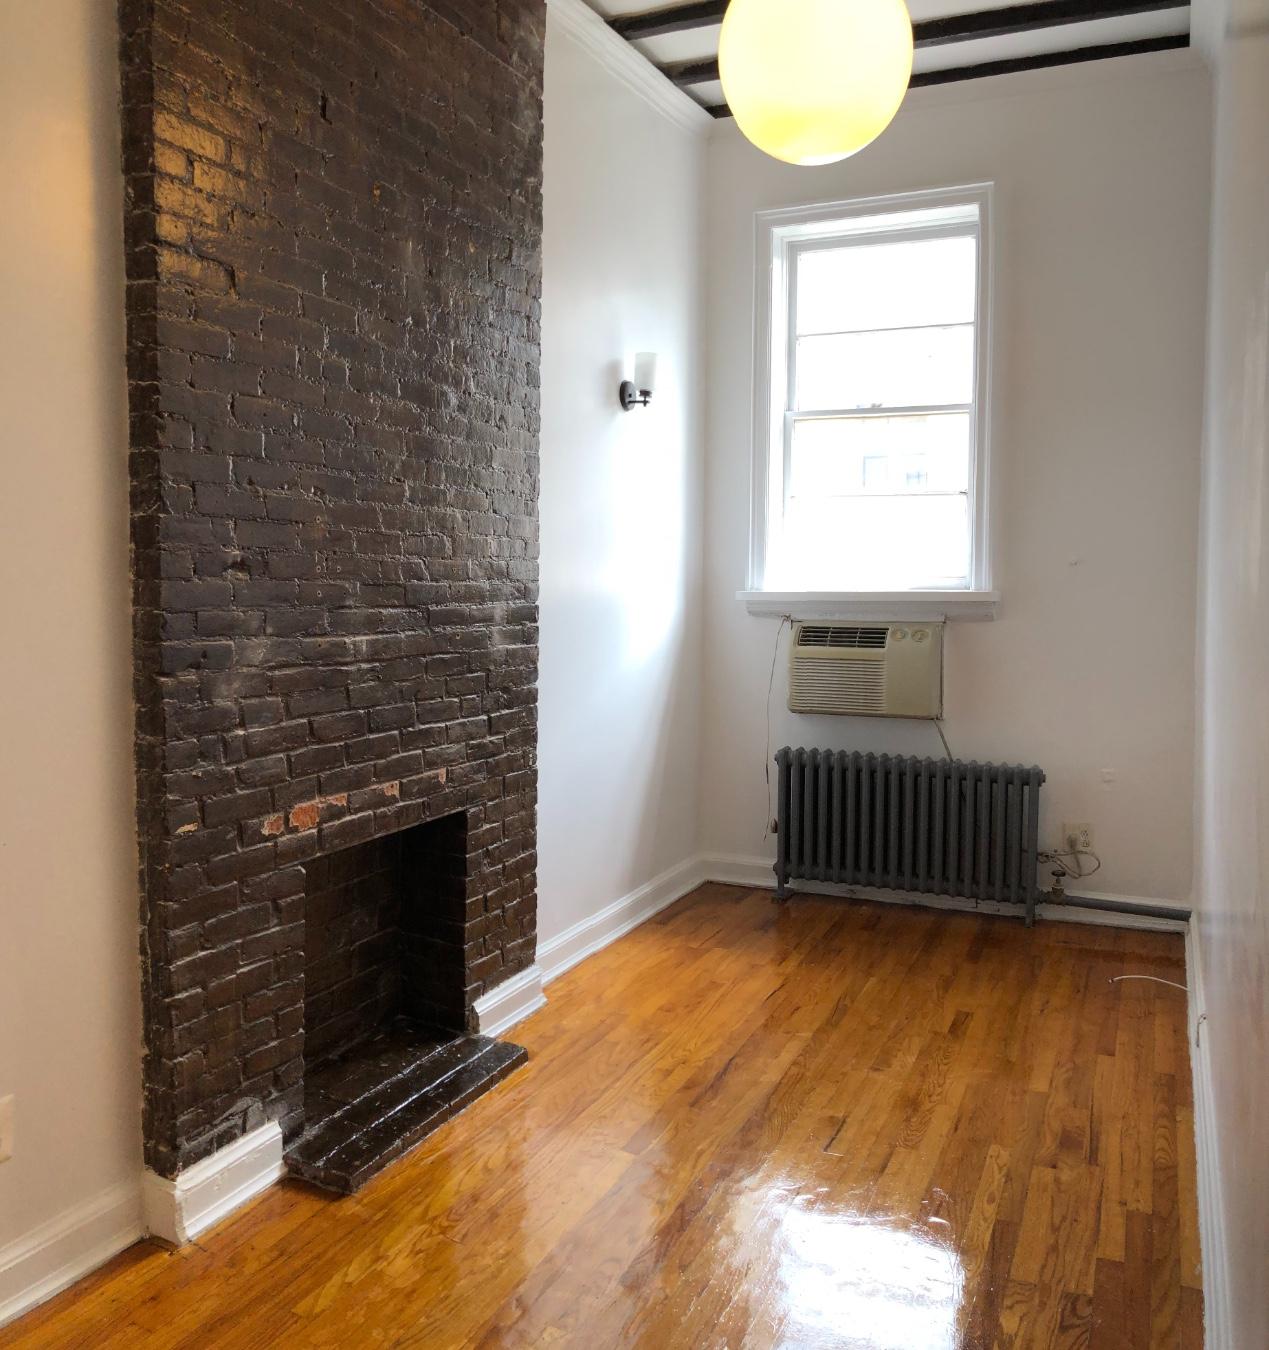 105 Christopher Street, Apt 3A, Manhattan, New York 10014